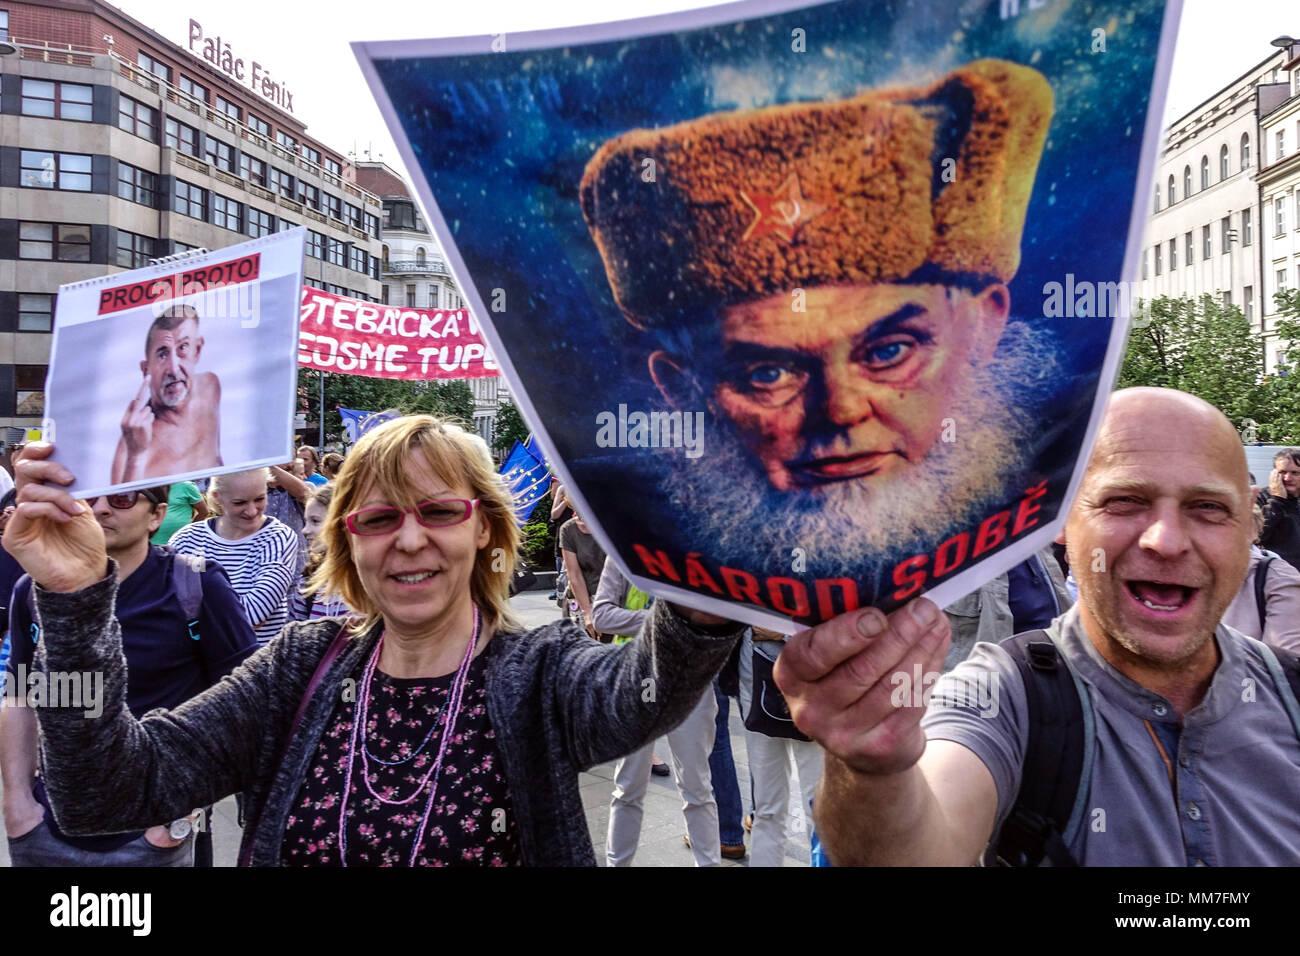 Prague, Czech Republic. 9th May, 2018. Demonstration against Premier Babis, President Zeman and the Communists, Credit: Radim Beznoska/Alamy Live News - Stock Image